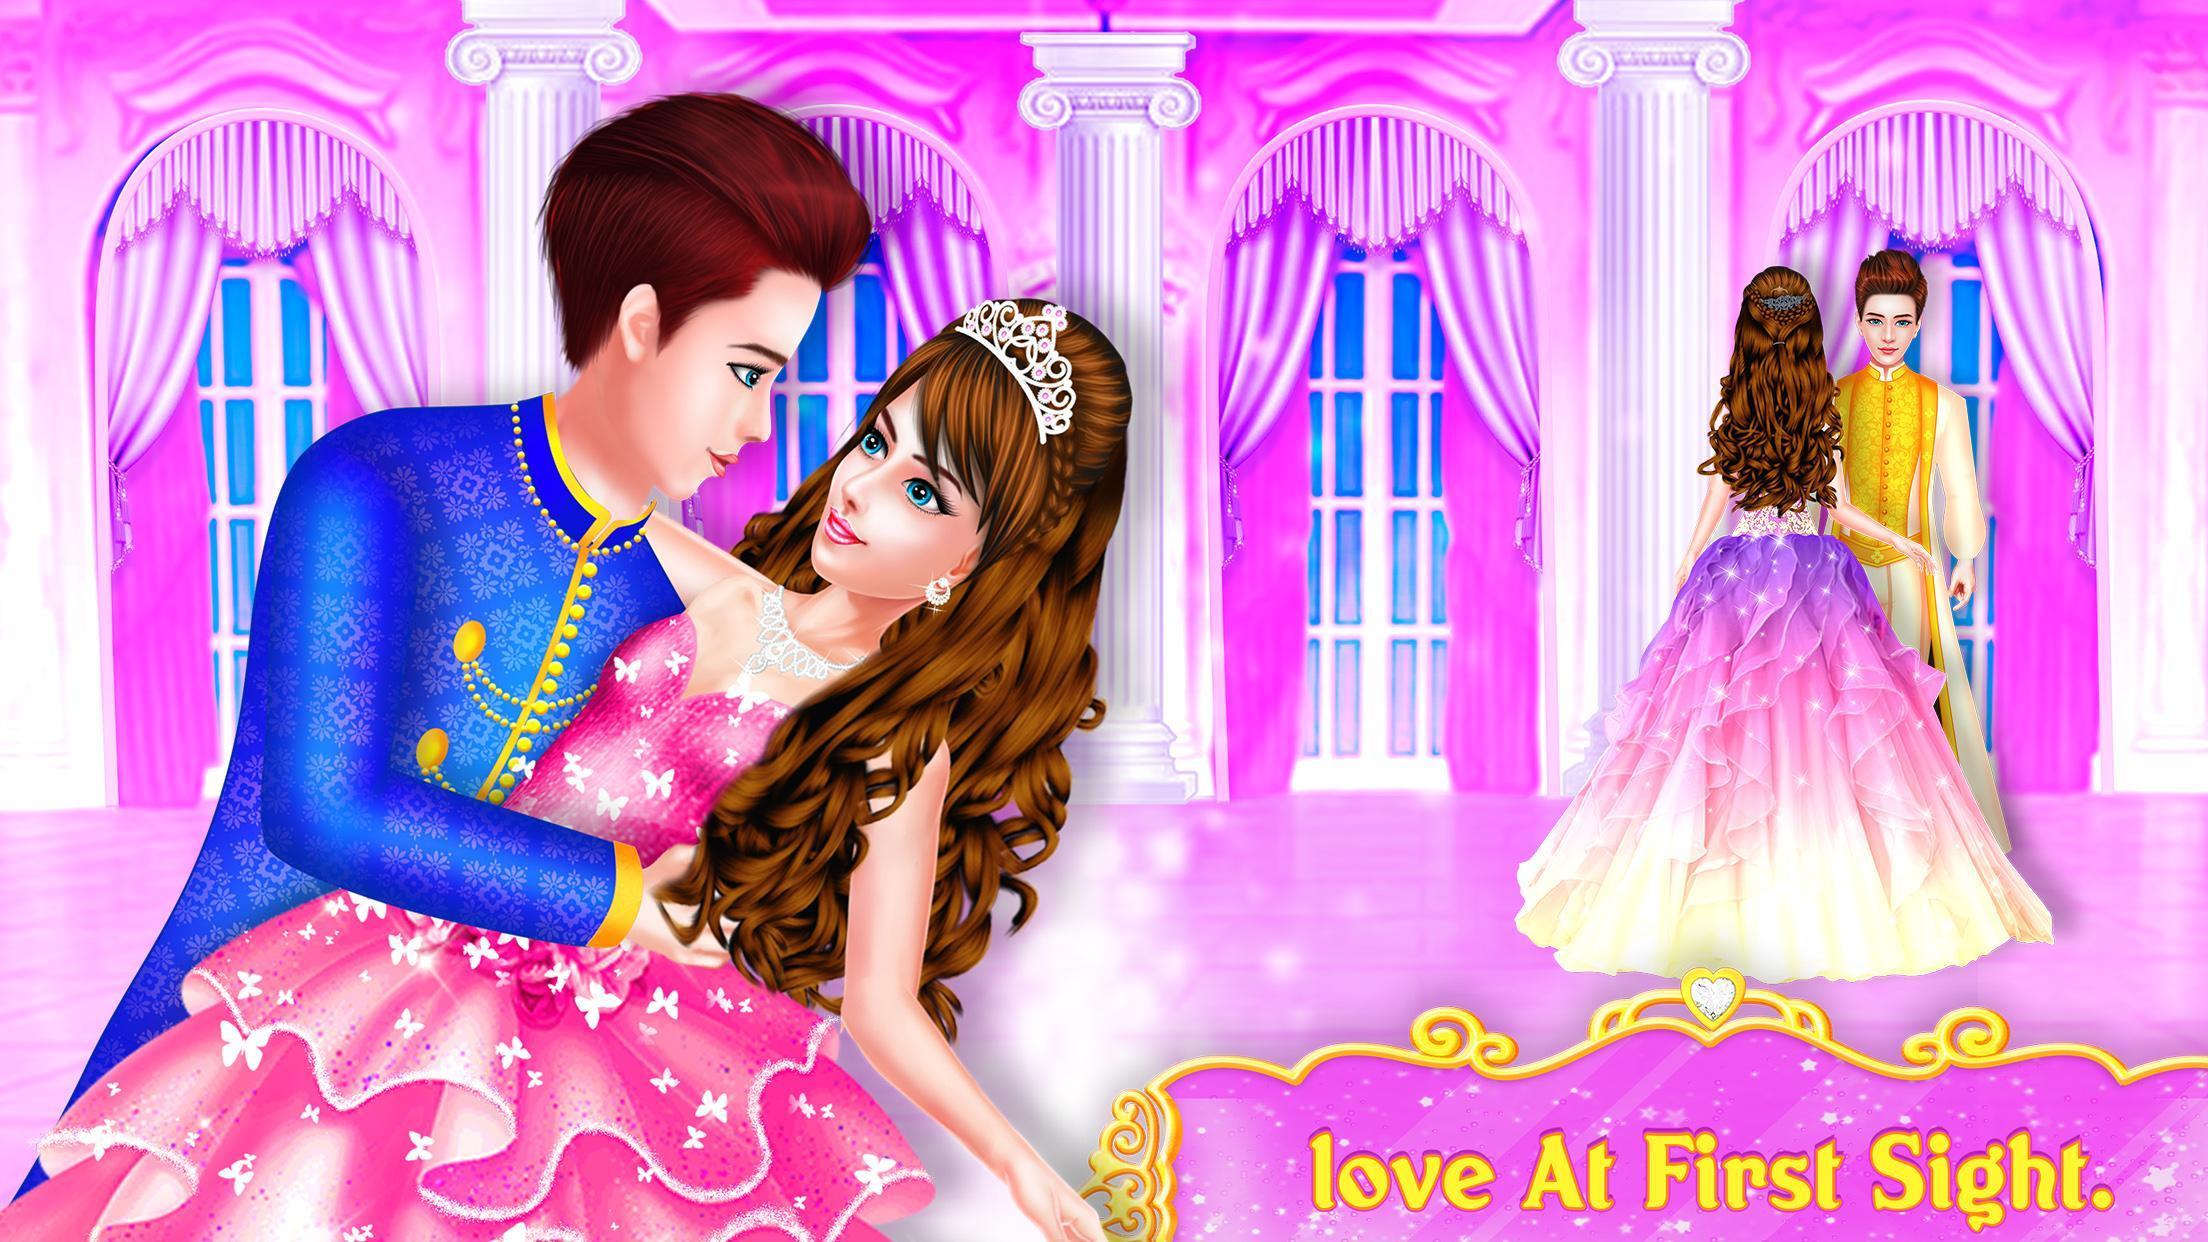 Prince Charles Love Crush Story 1.7 Screenshot 1